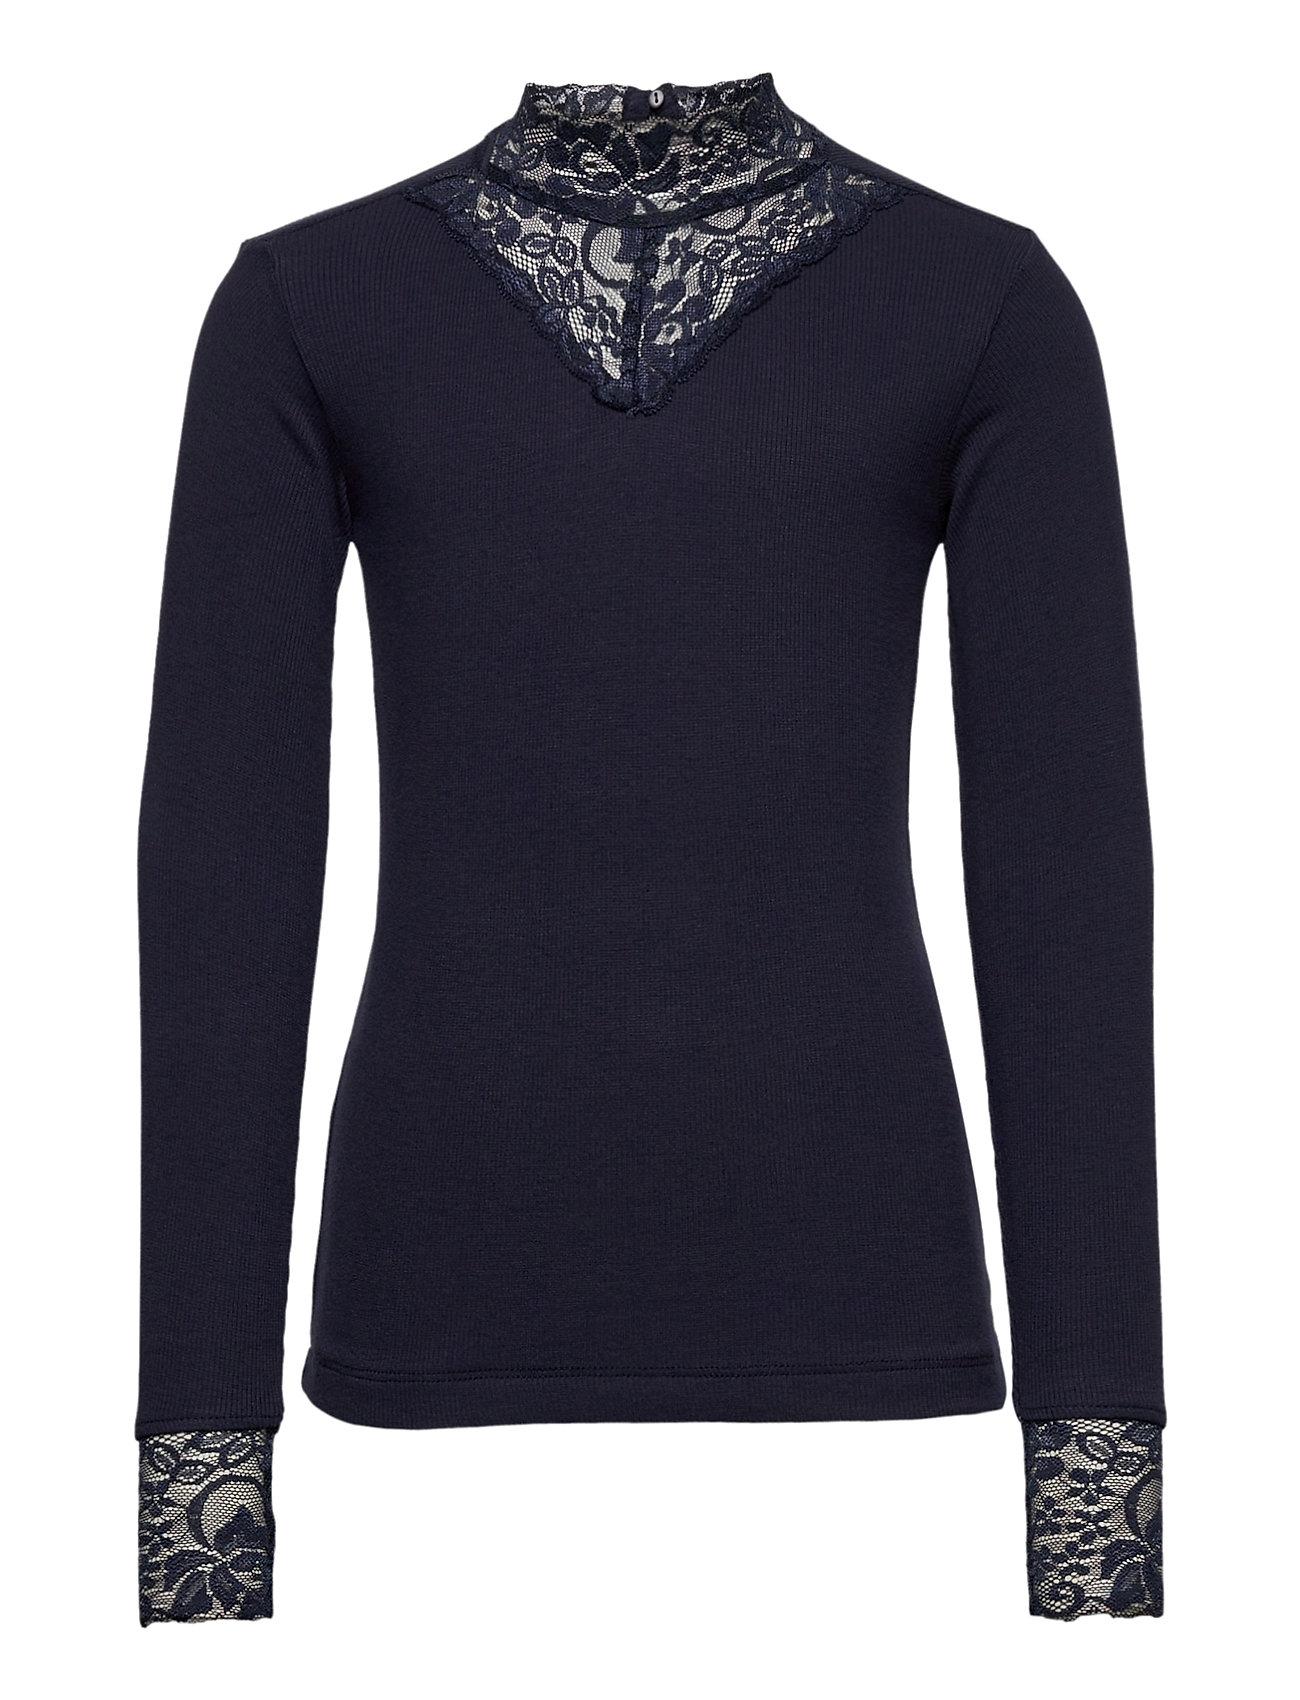 Image of Olace L_s Tee Langærmet T-shirt Blå The New (3454944039)